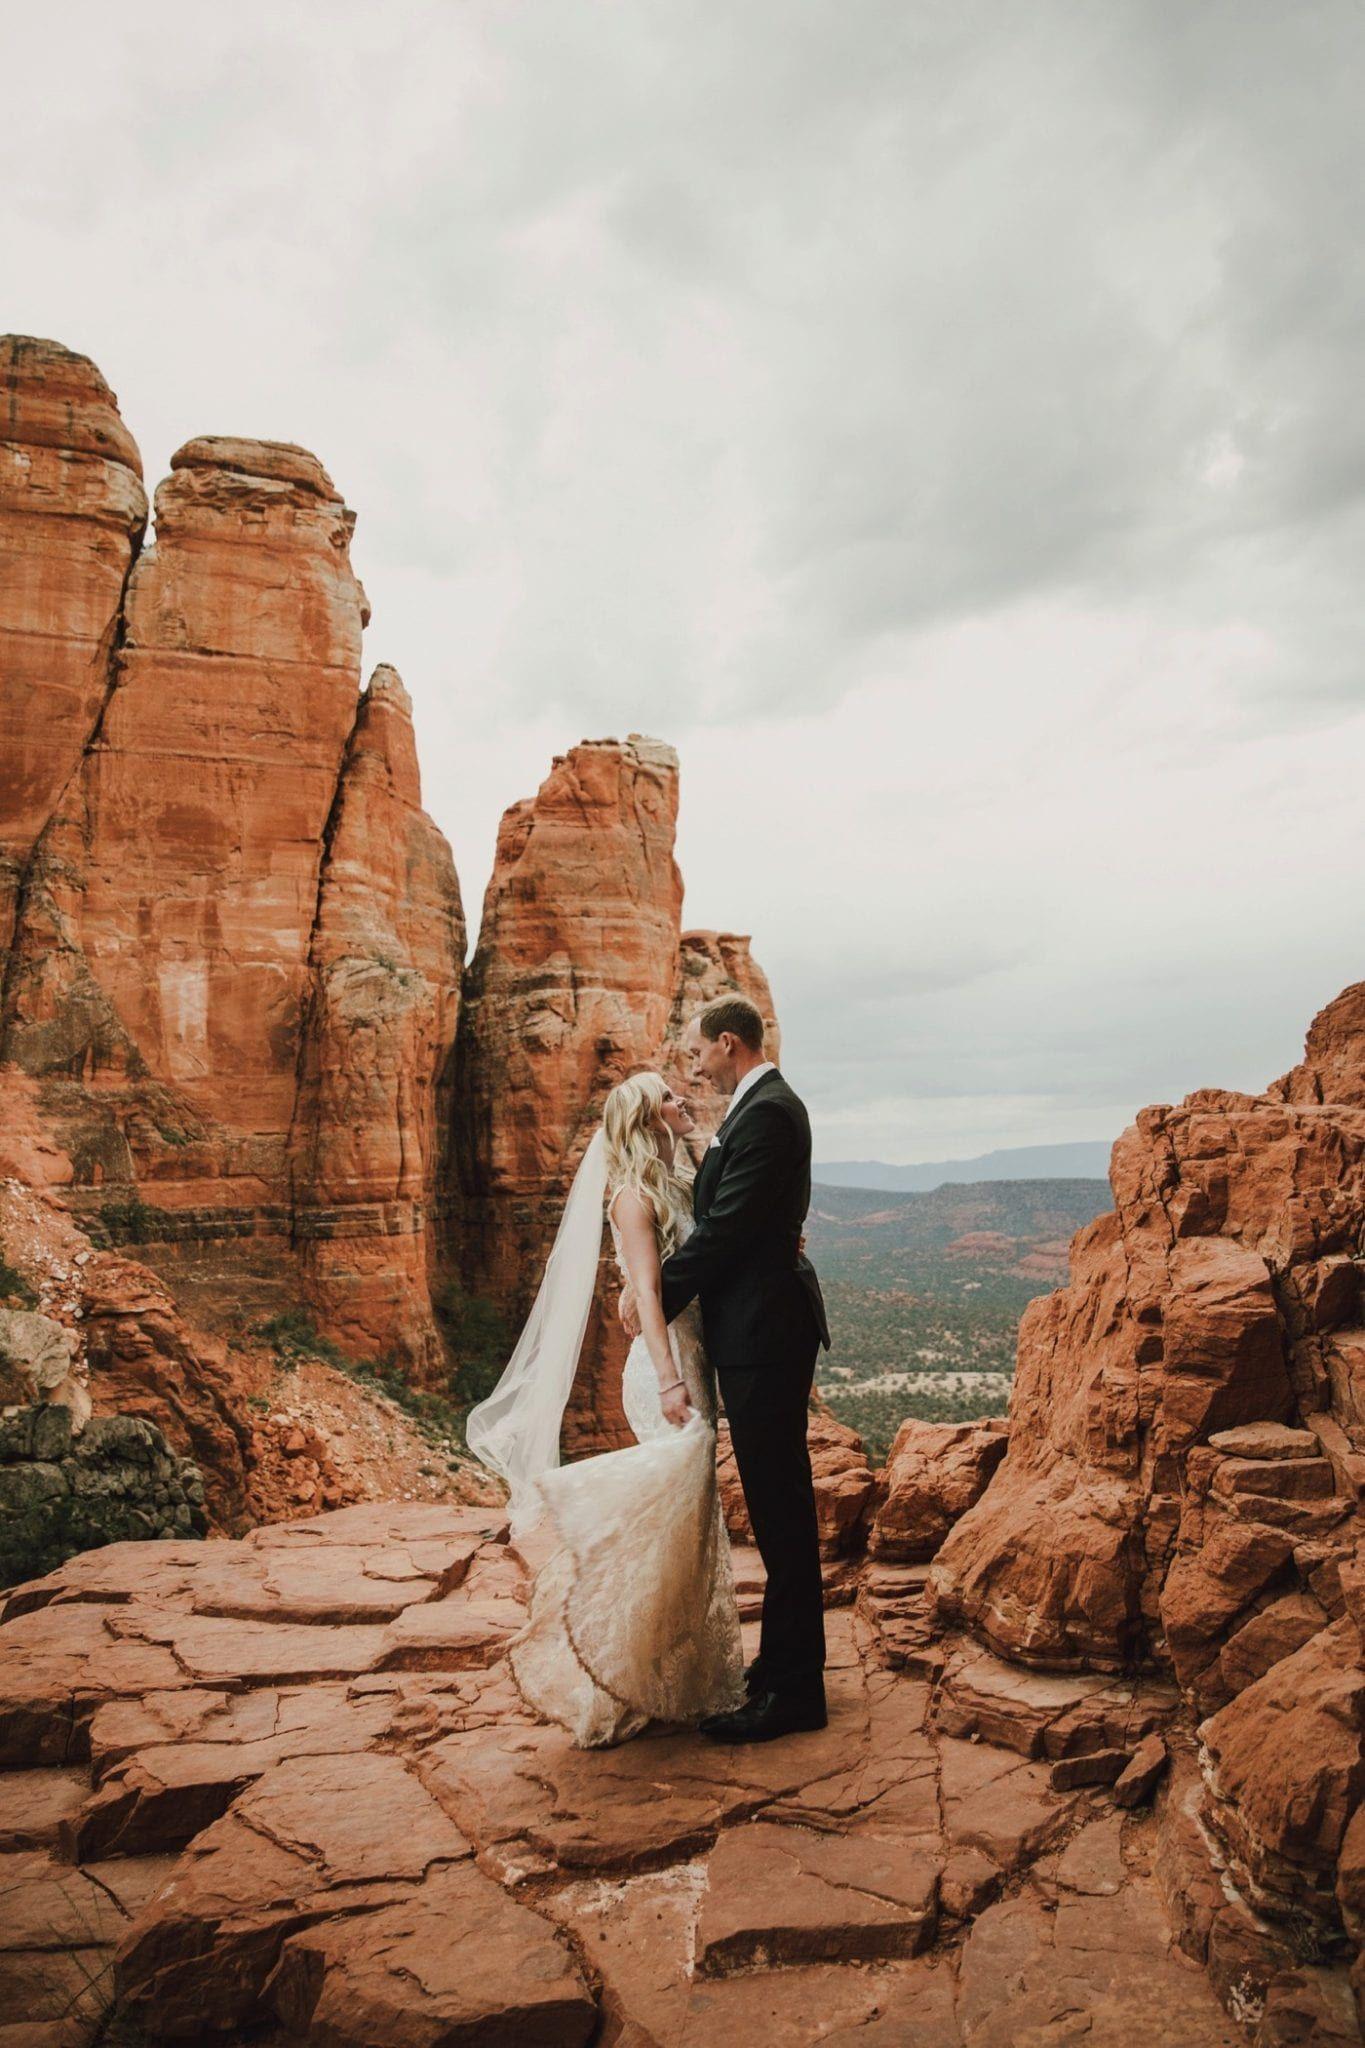 Blog | Jane in the Woods || Sedona & Destination Wedding Photographer, Planner & Florist